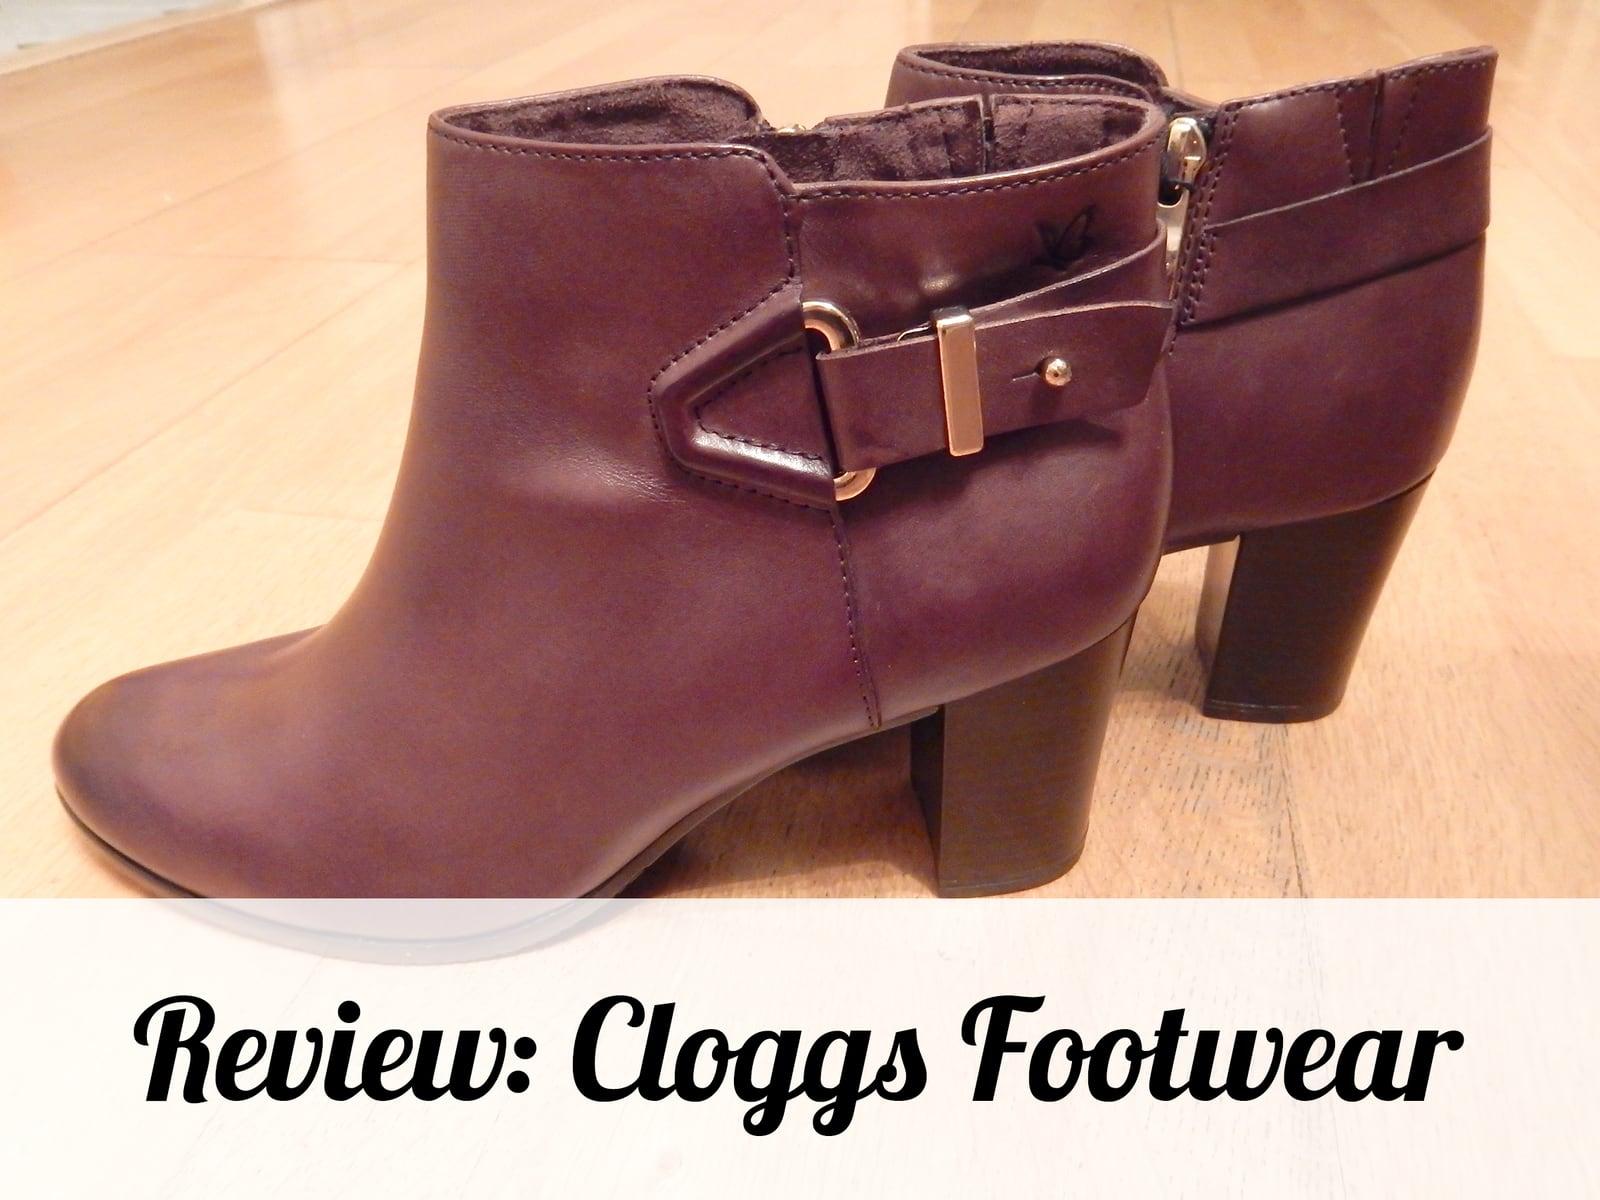 cloggs footwear